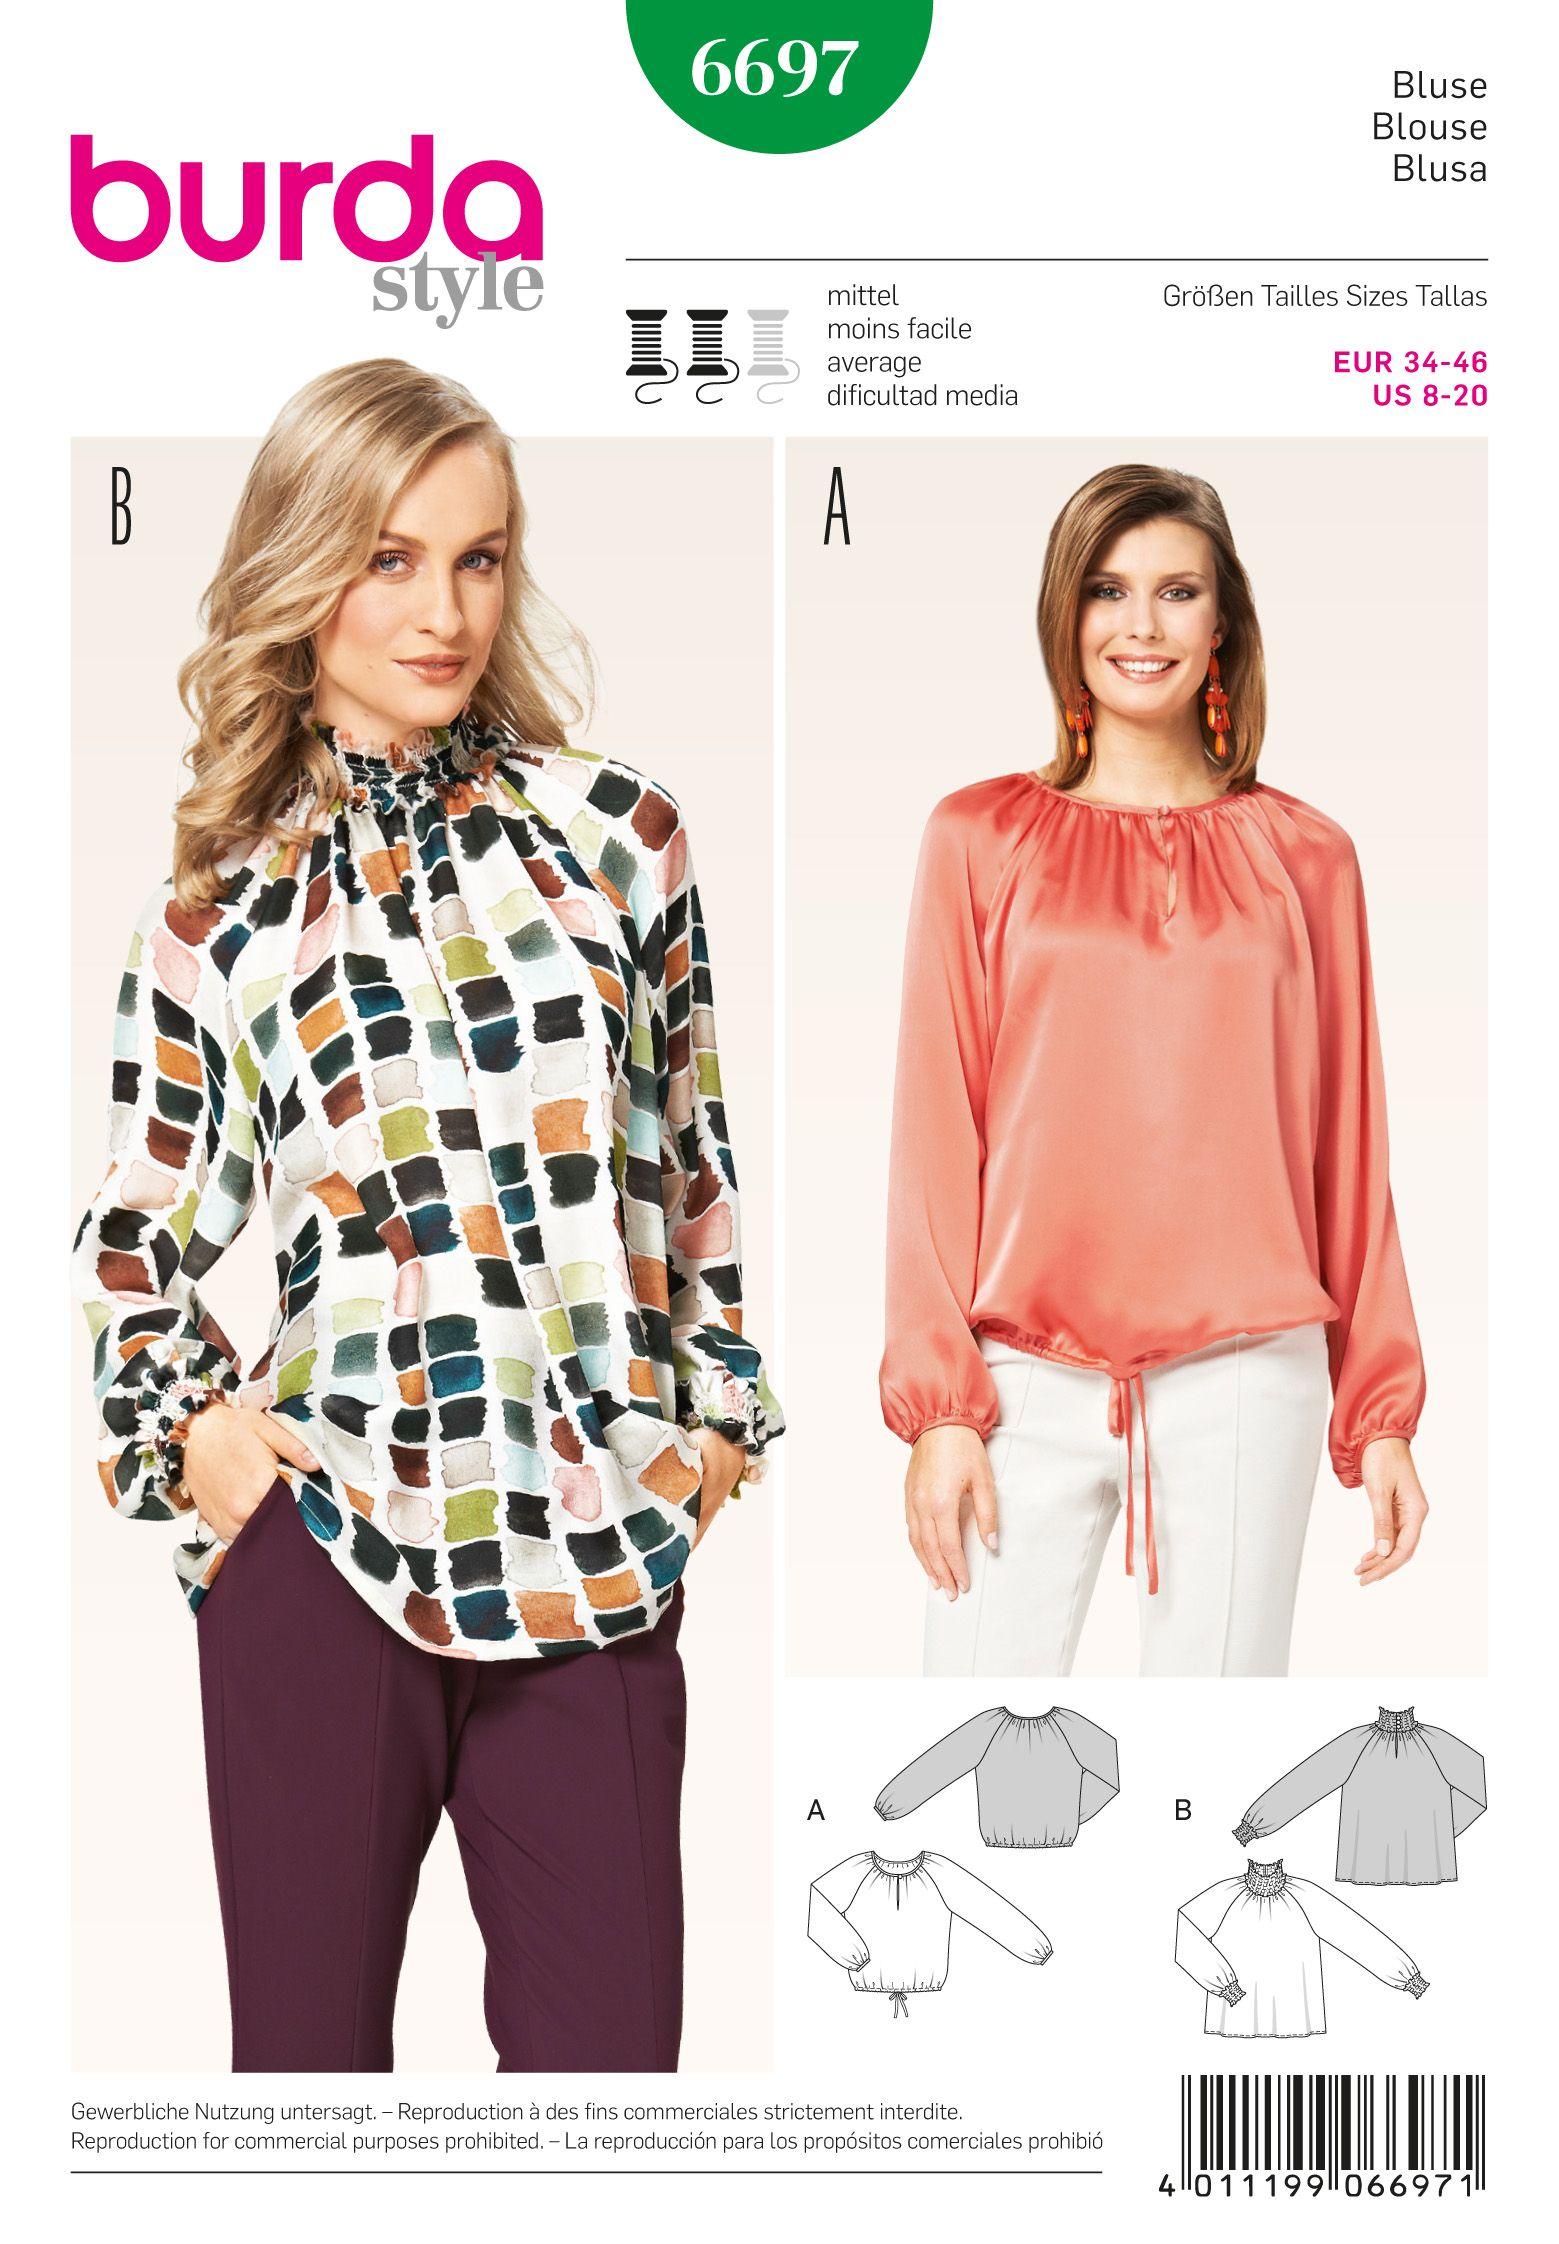 Burda Misses\' Blouse 6697 | Sewing | Pinterest